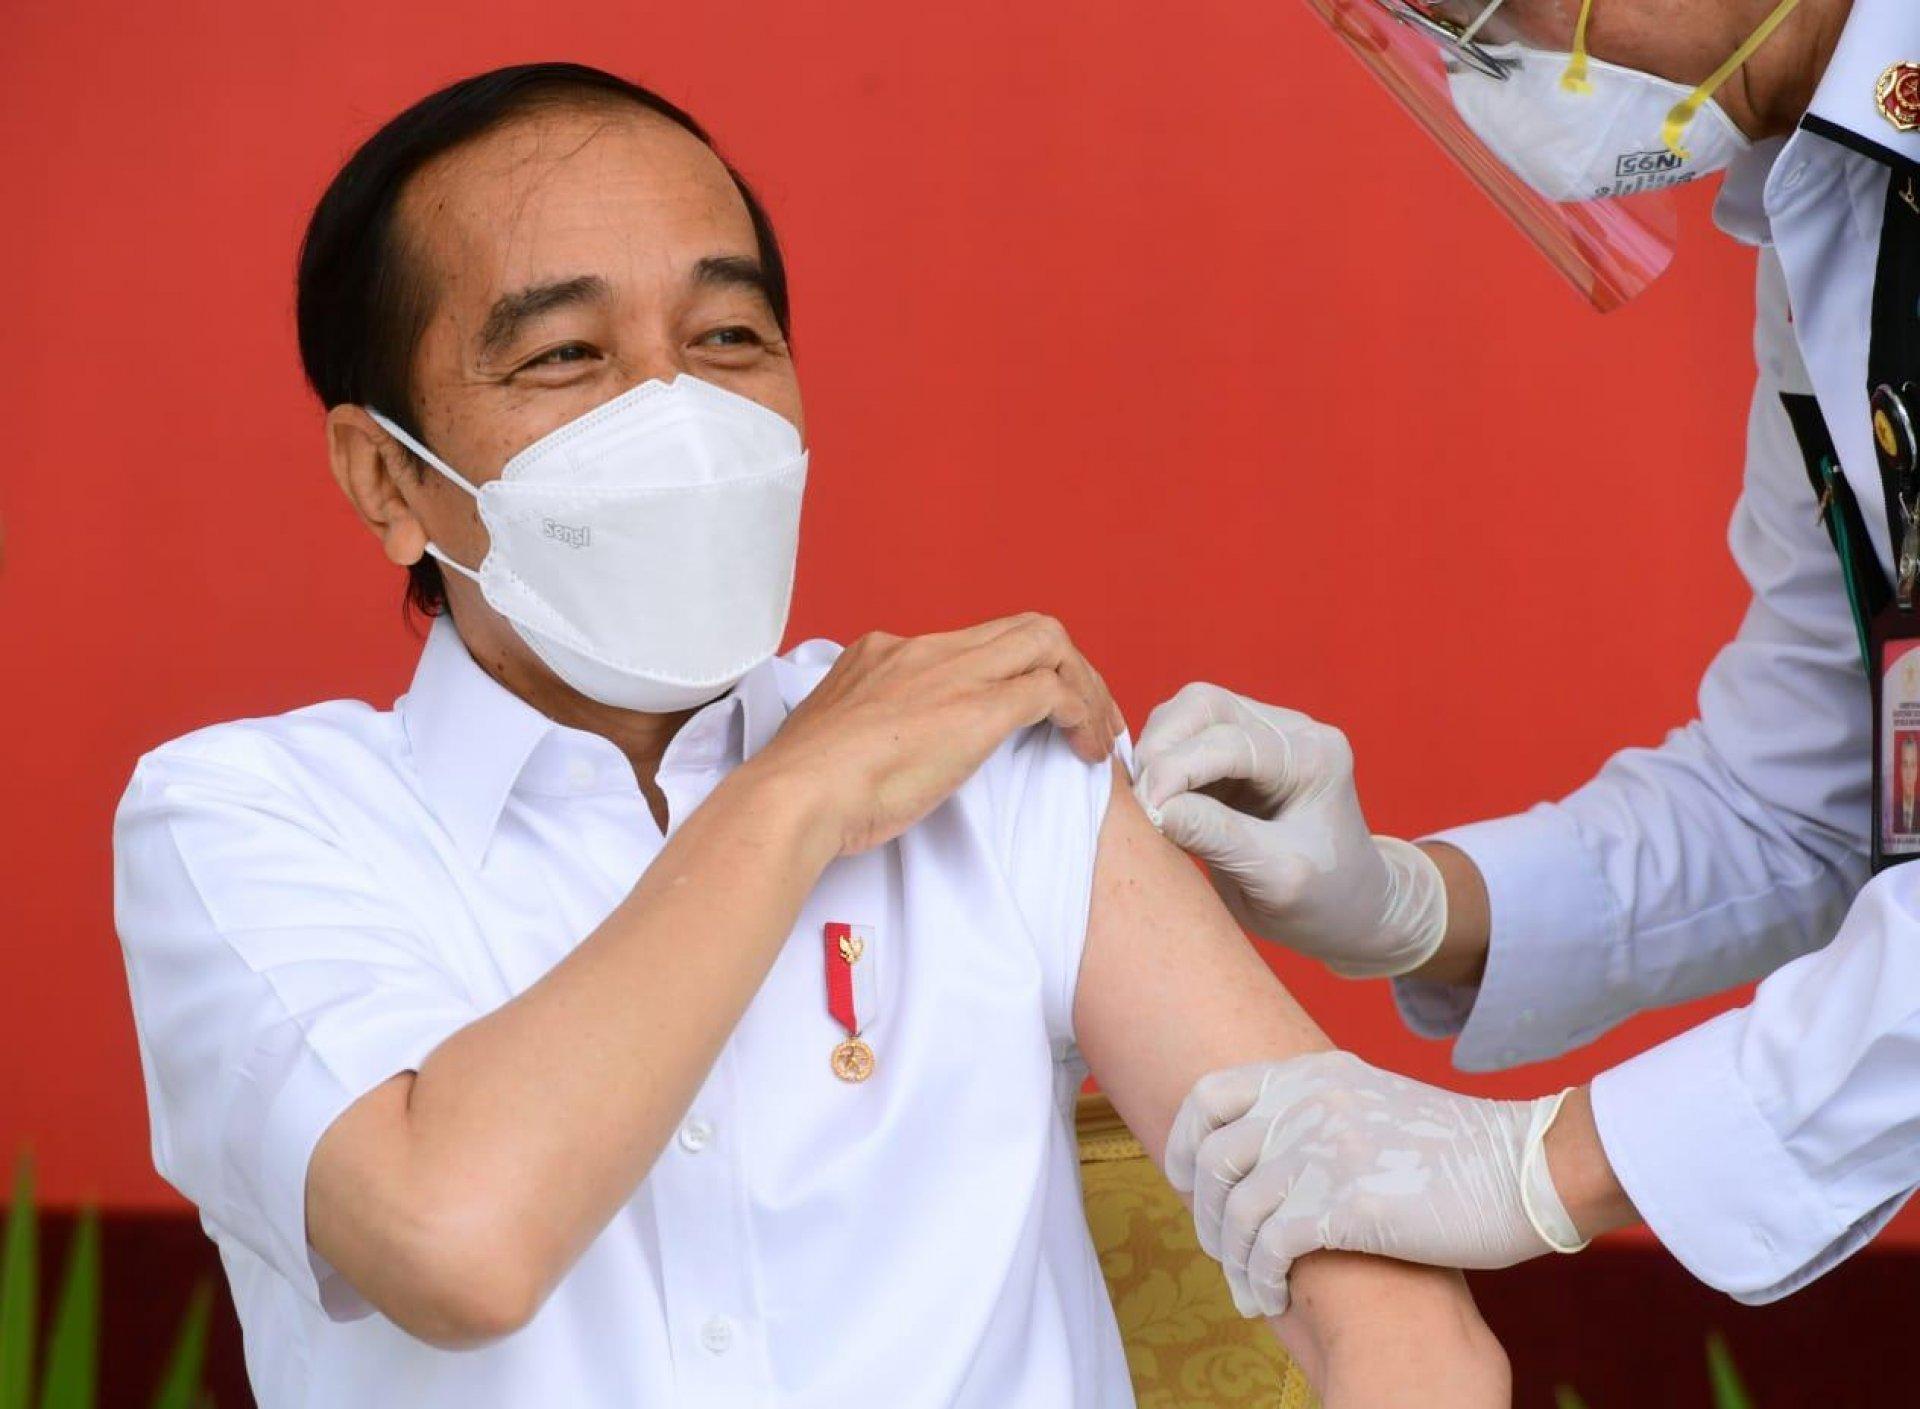 Program Vaksinasi Dimulai, Presiden Jokowi Terima Suntikan Dosis Pertama Vaksin COVID-19